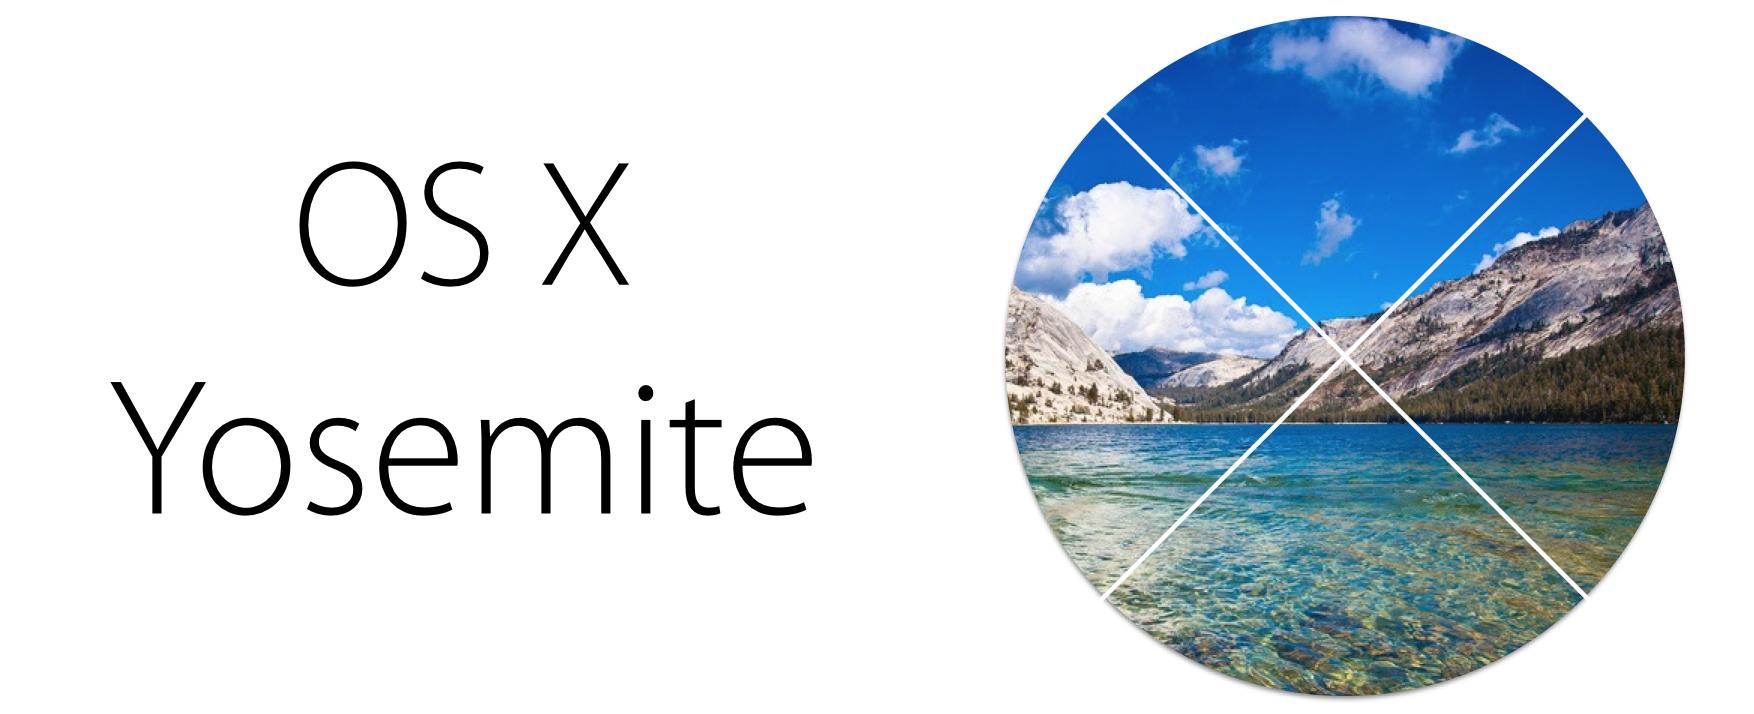 Conceito de ícone para o OS X 10.10